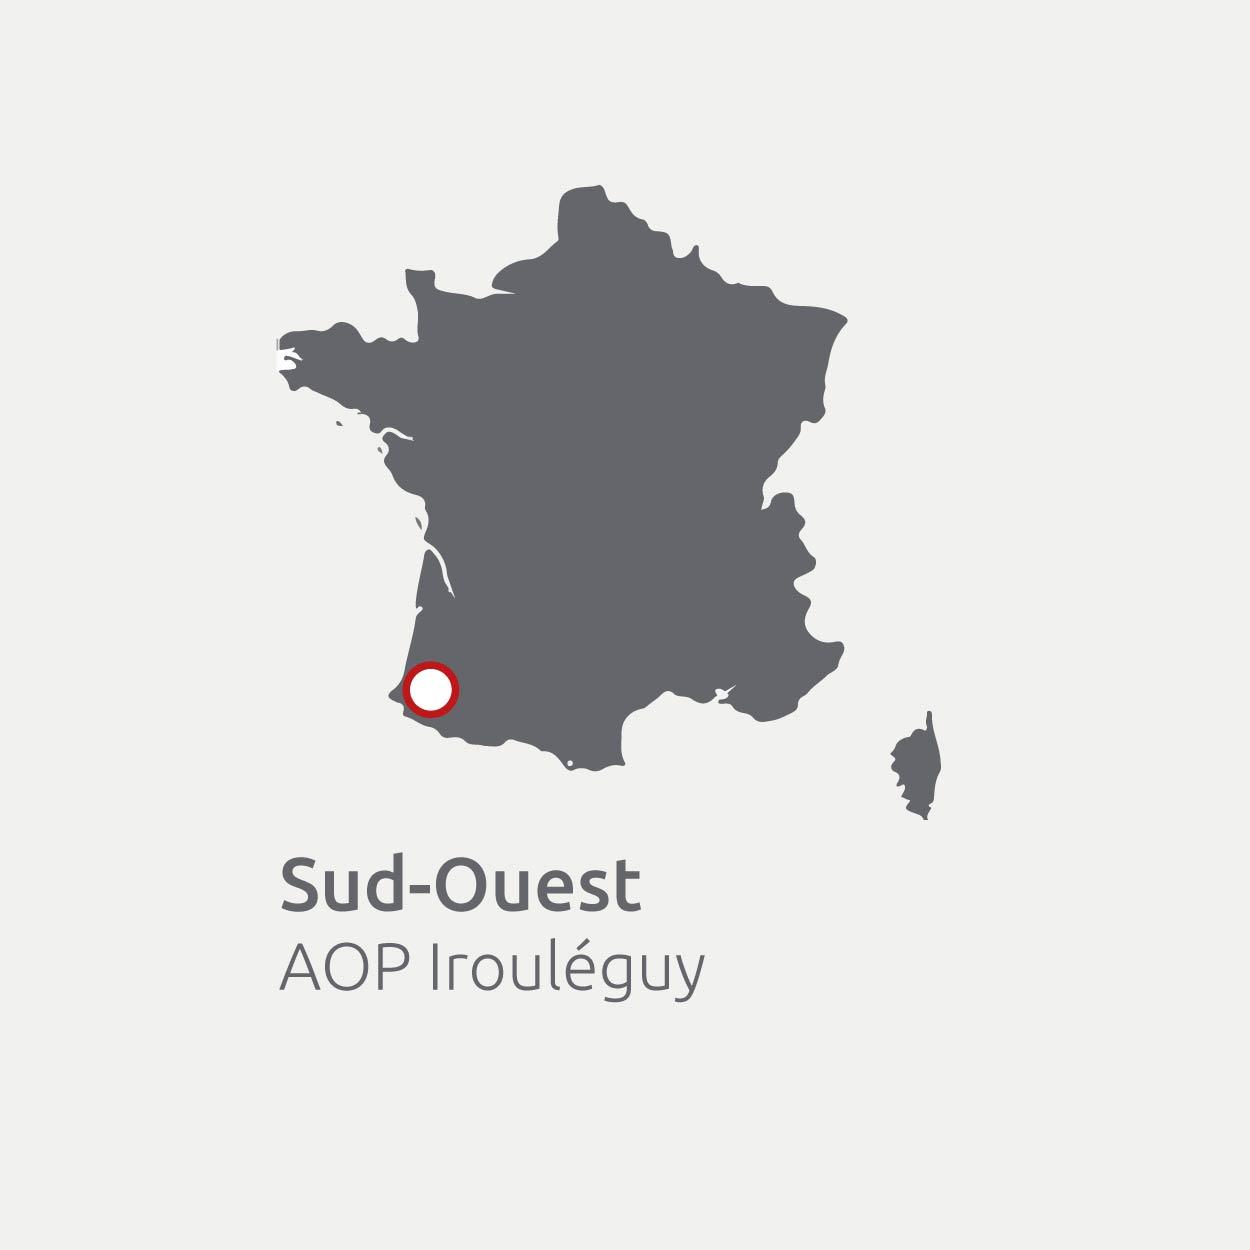 aop_irouleguy